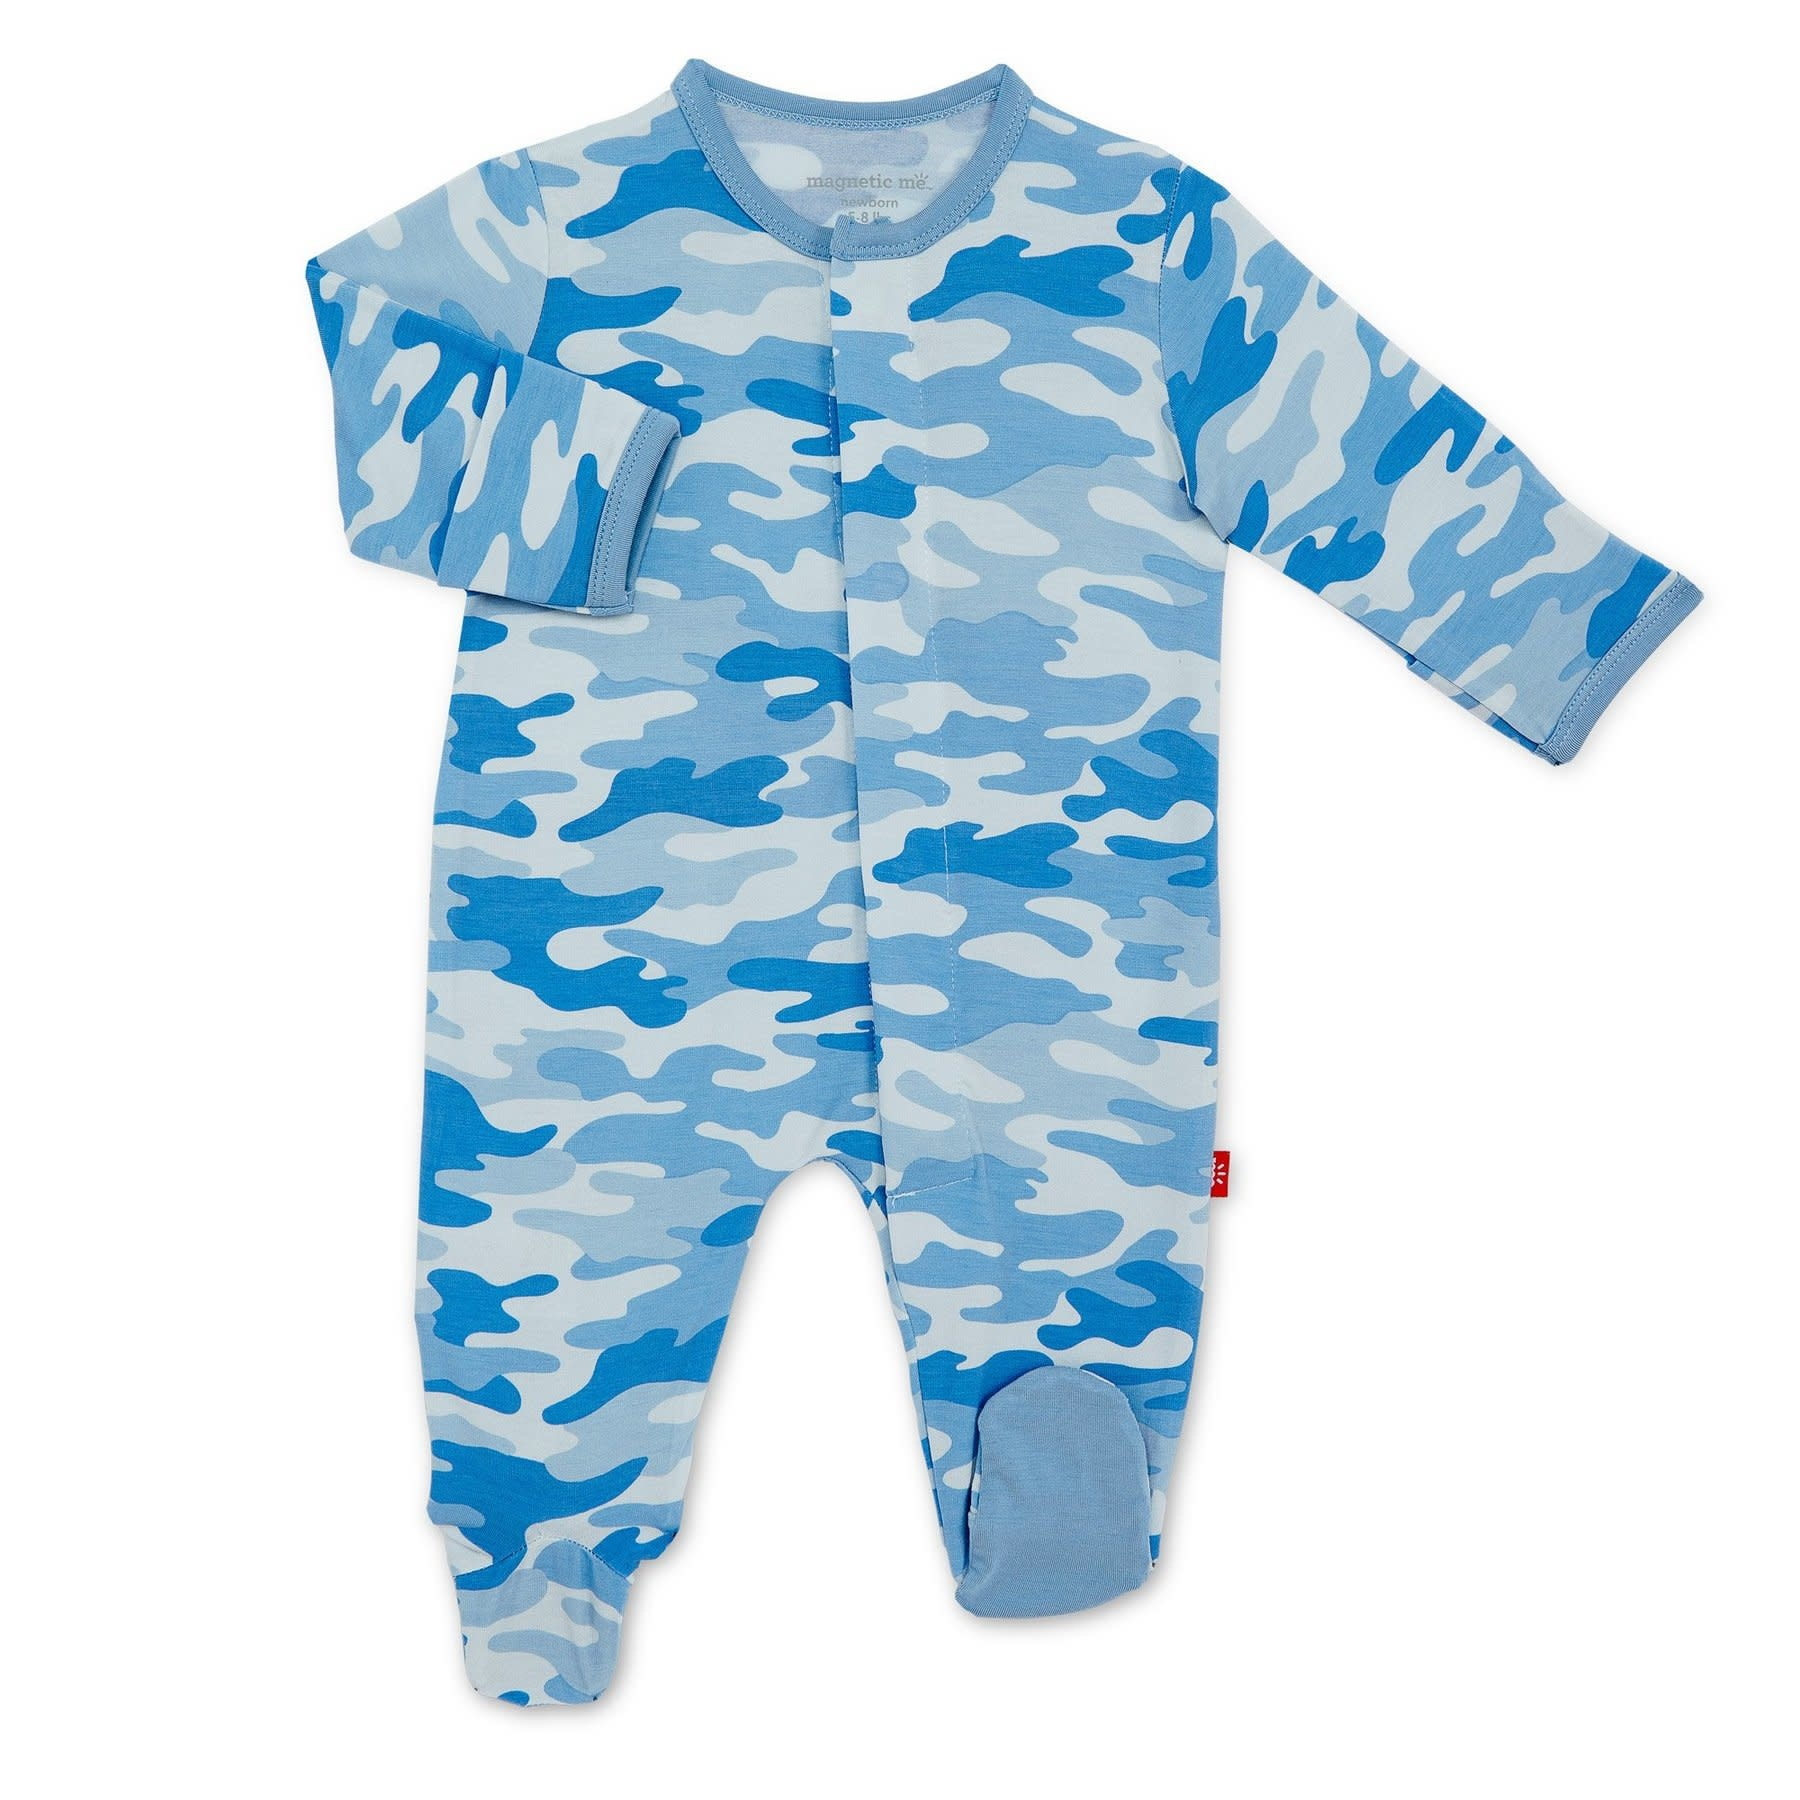 Magnificent Baby Blue Camo Modal Footie